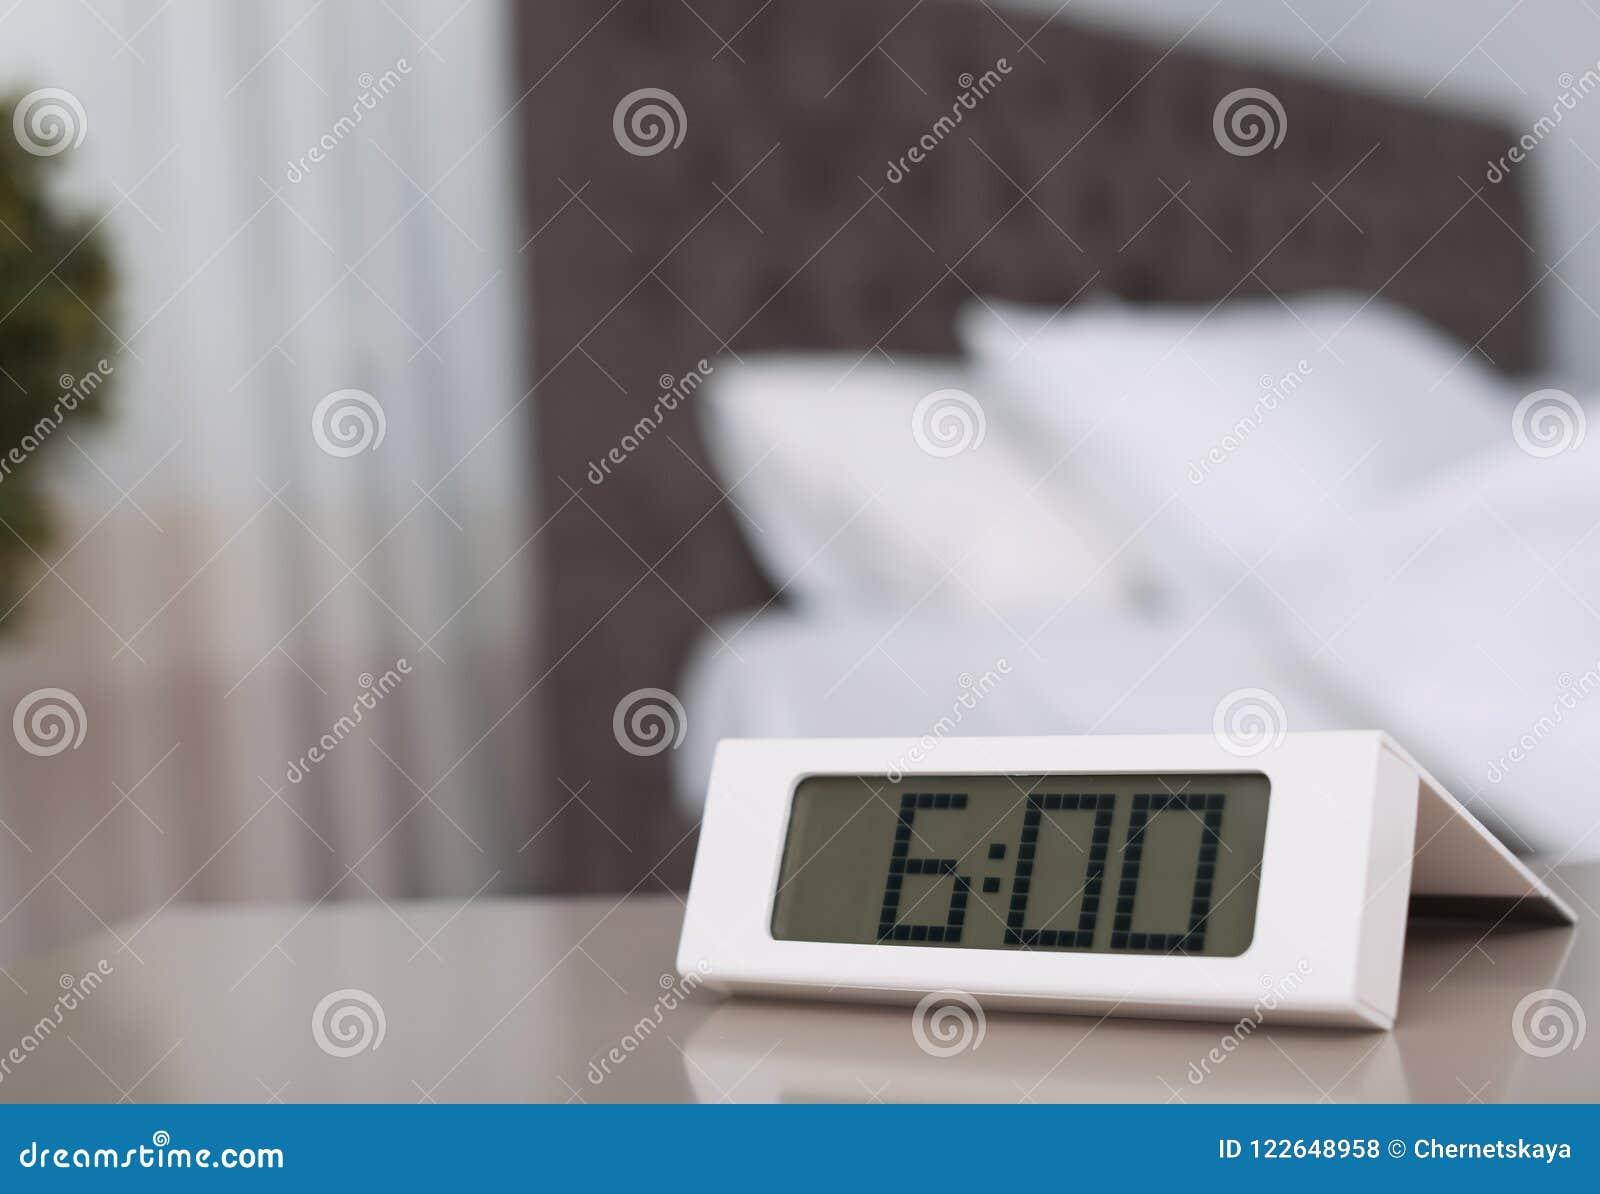 Digital Alarm Clock On Table In Bedroom.